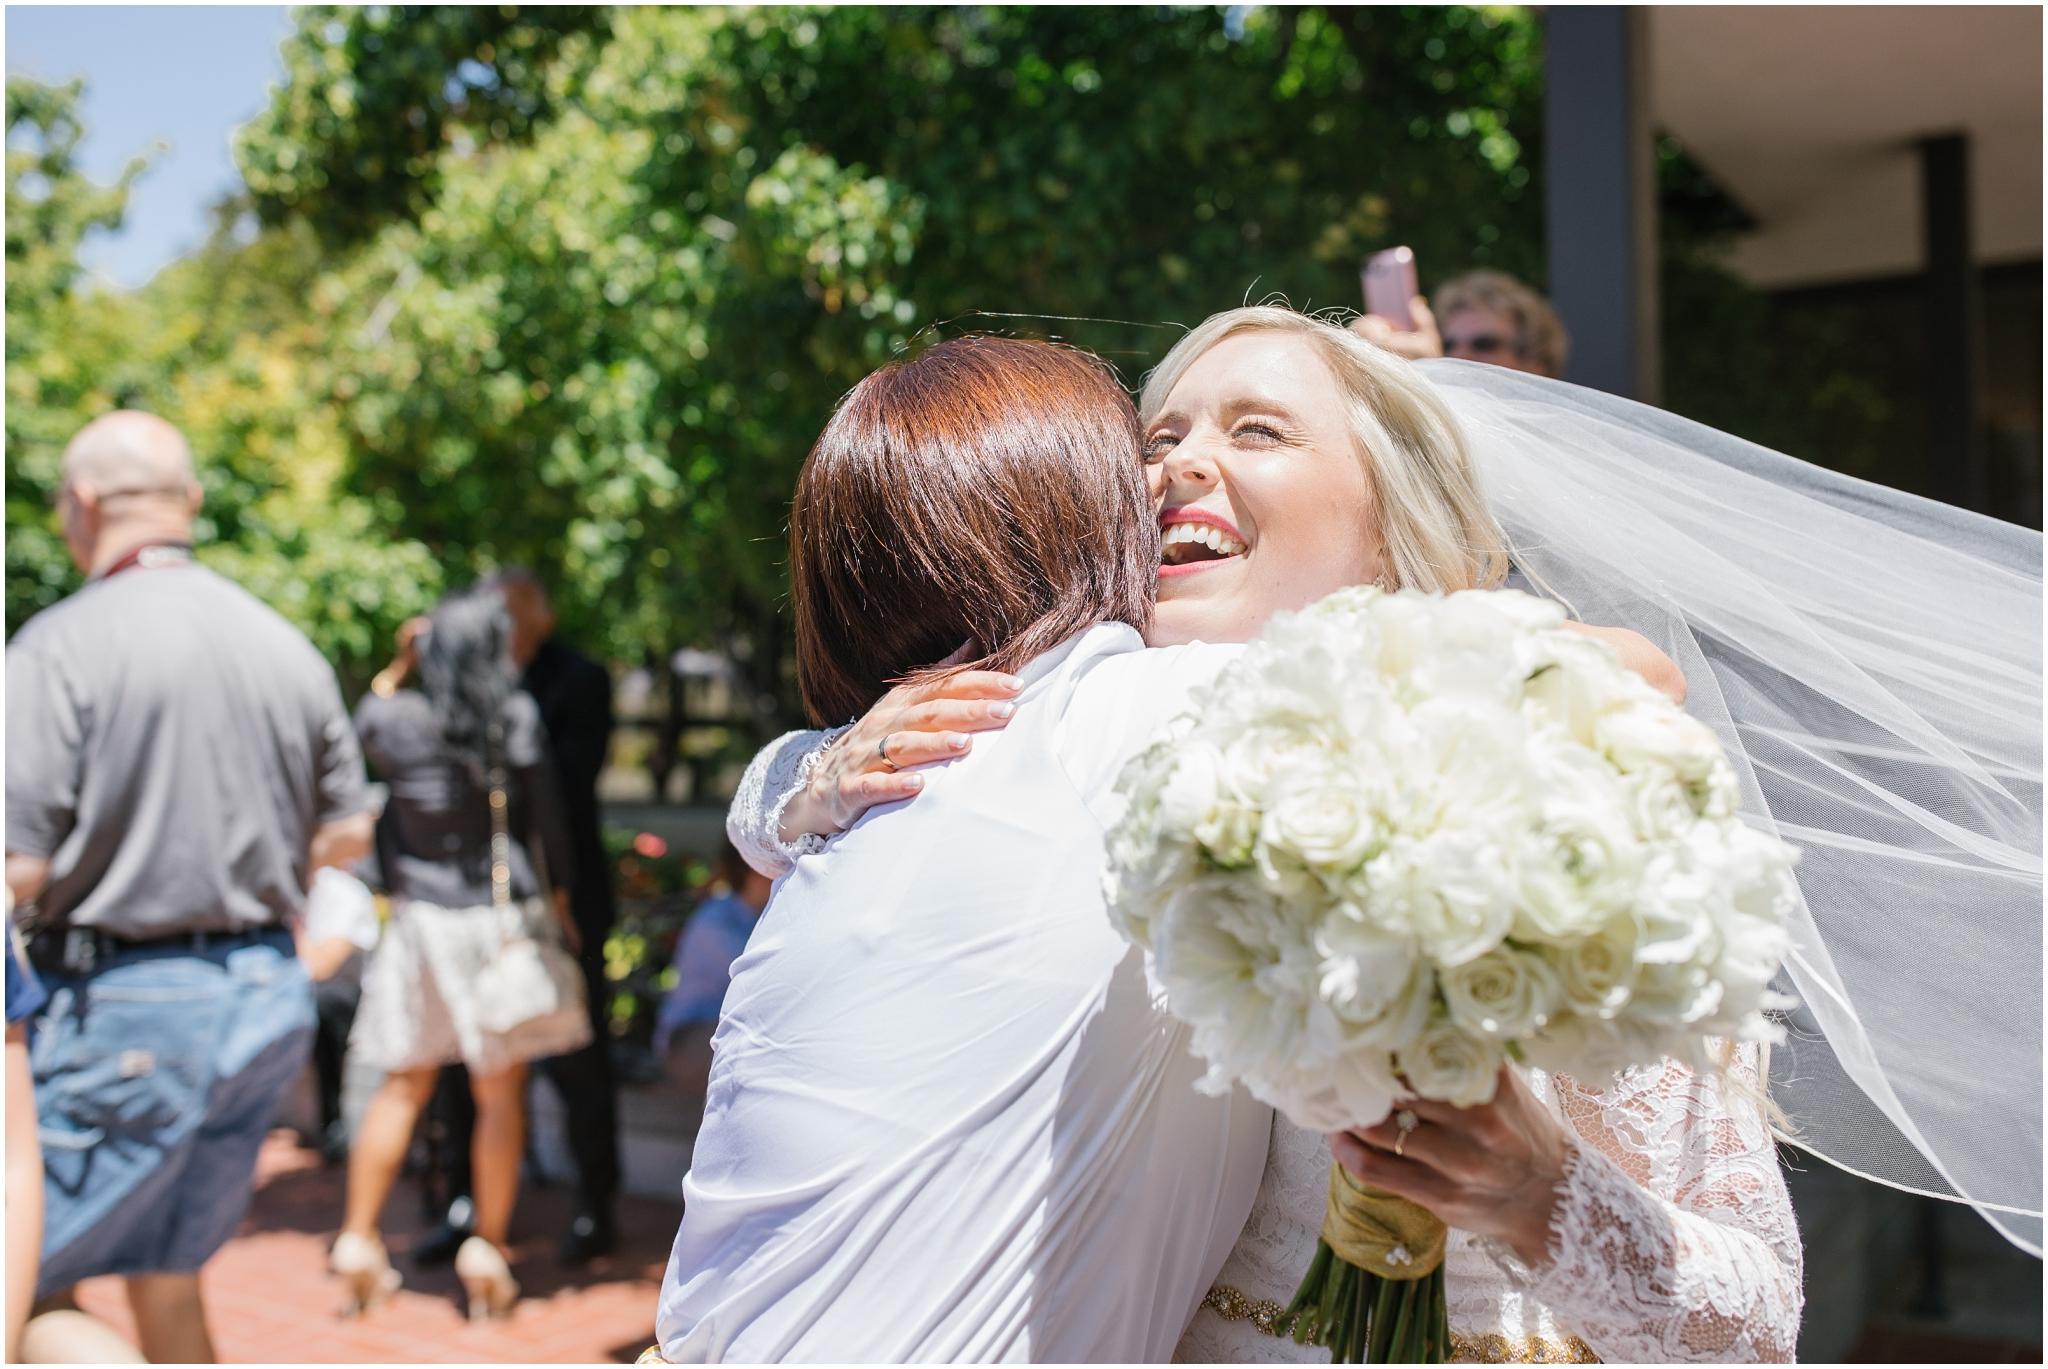 CherylandTyler-9_Lizzie-B-Imagery-Utah-Wedding-Photographer-Salt-Lake-City-Temple-Wells-Fargo-Building-Reception.jpg